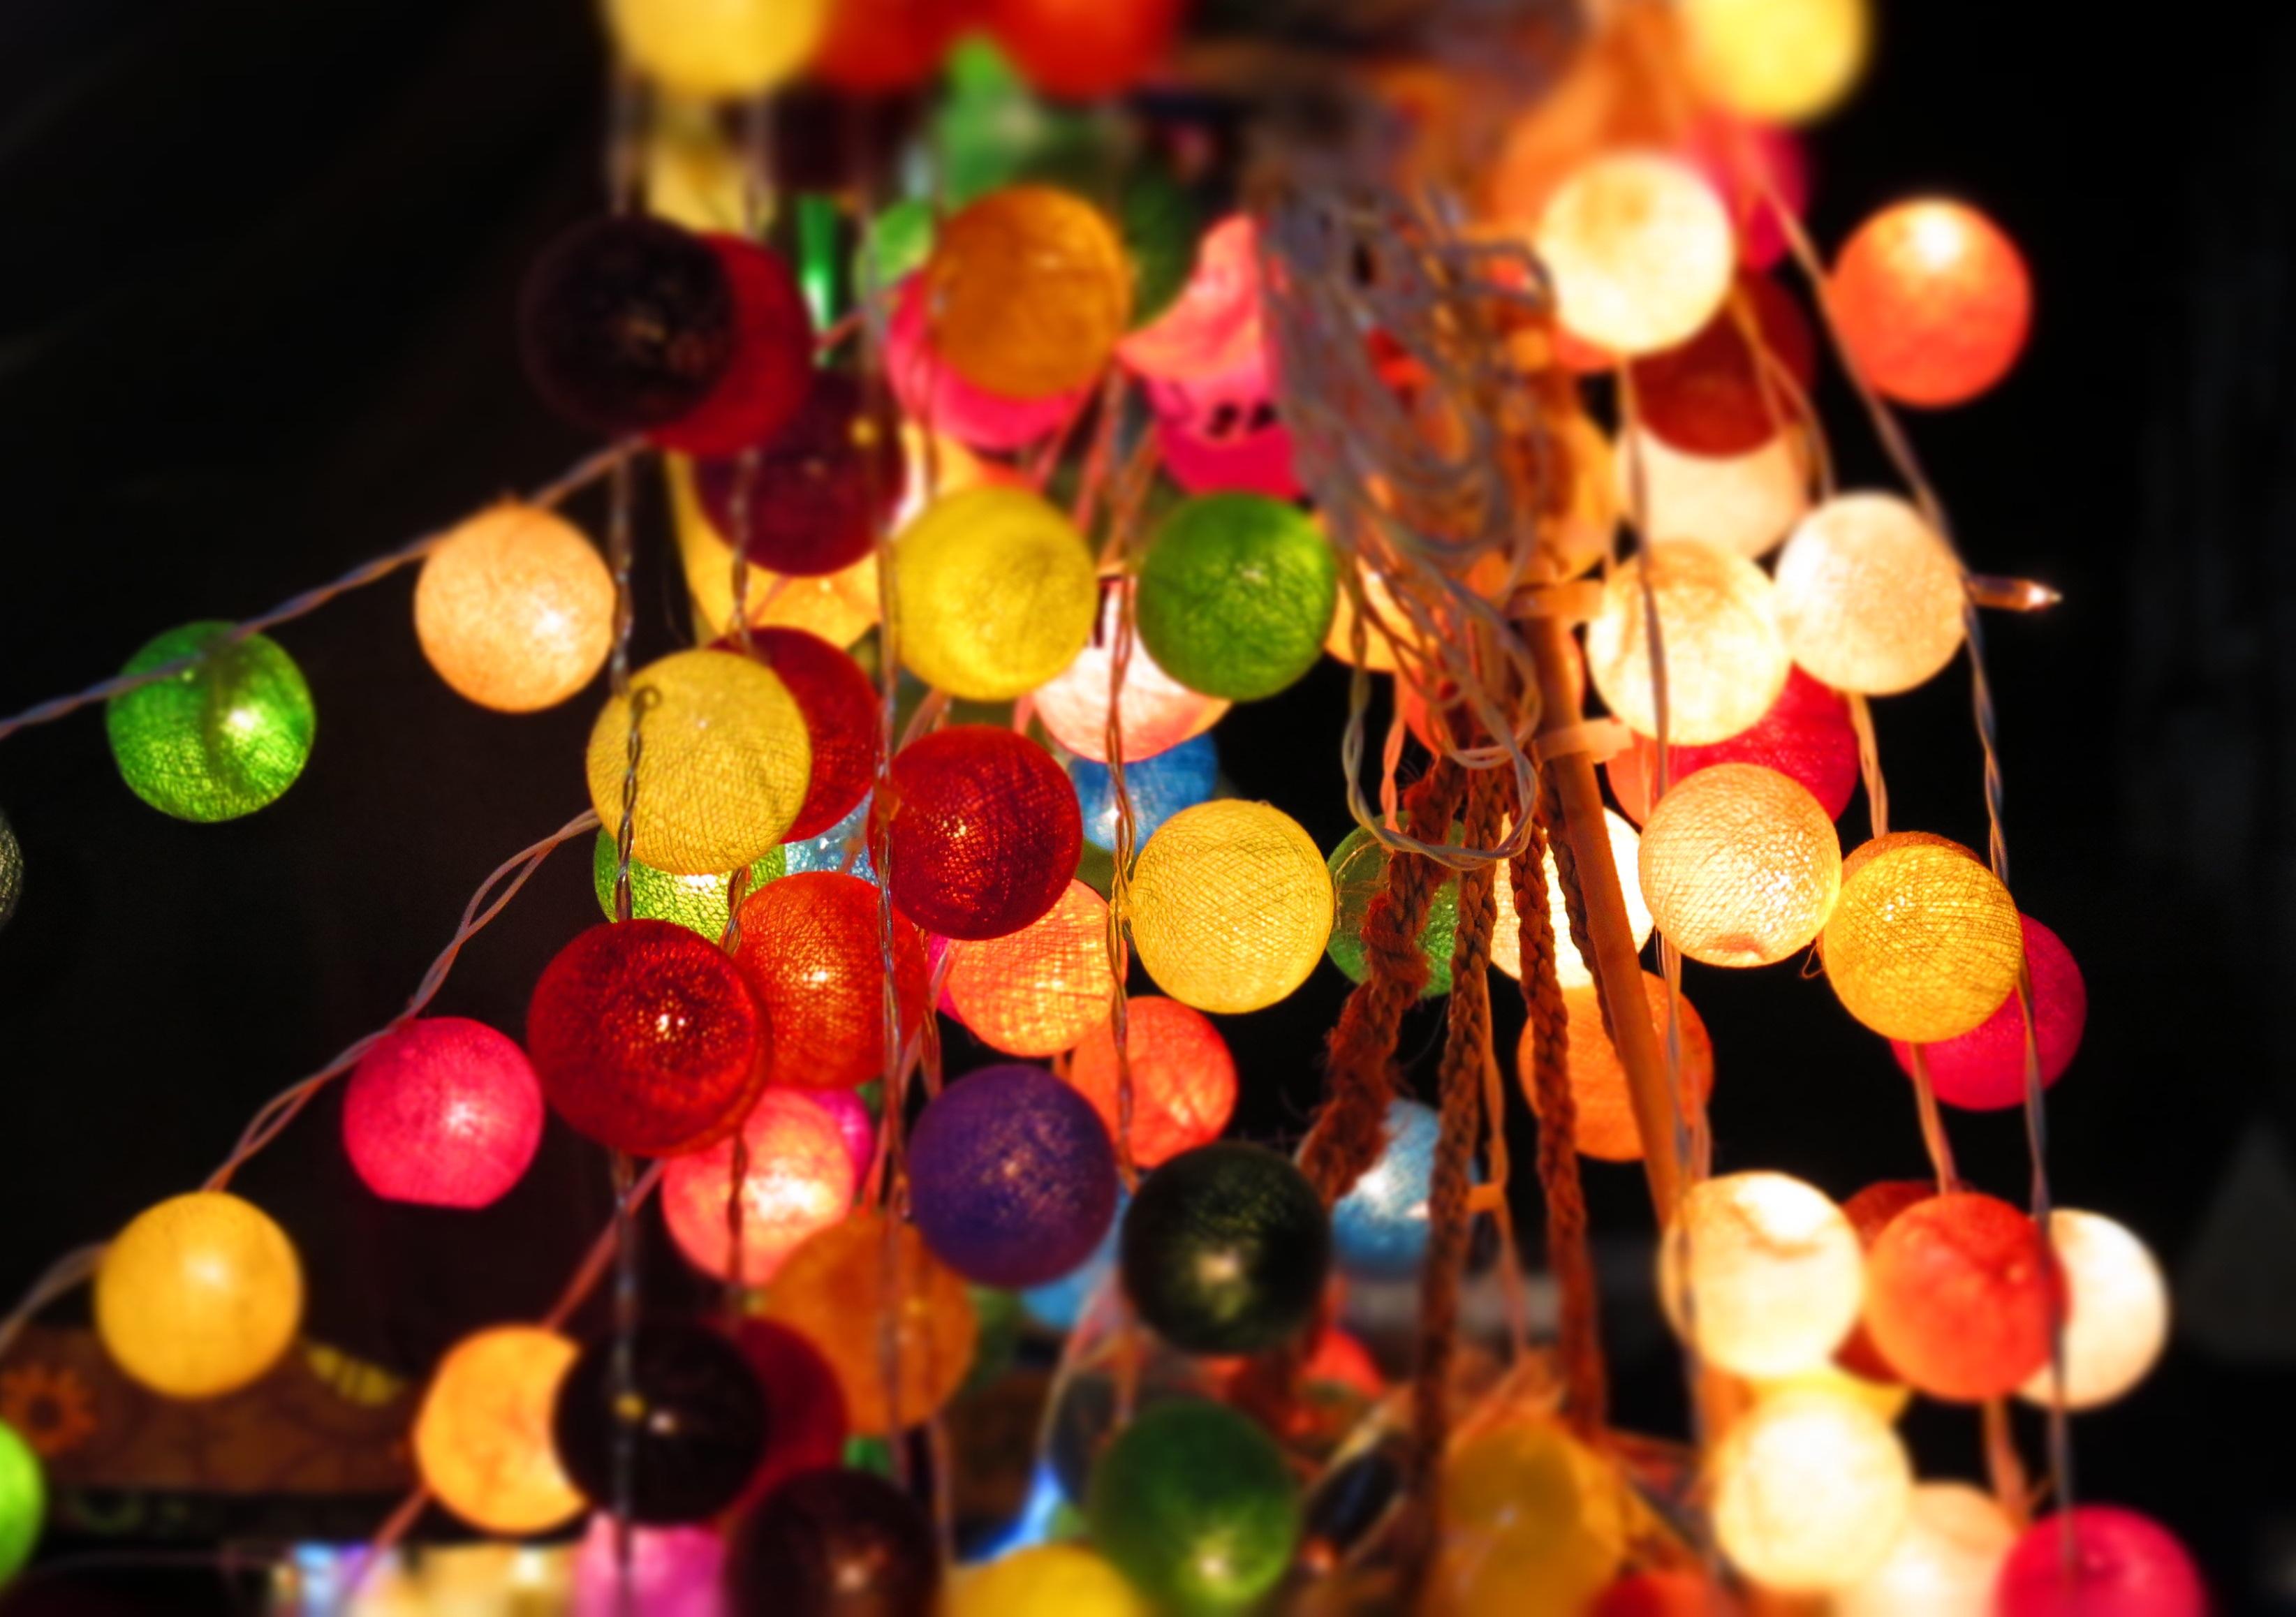 jardn iluminacin rbol de navidad decoracin navidea bolas dulzura fotografa macro iluminacin exterior luces de navidad